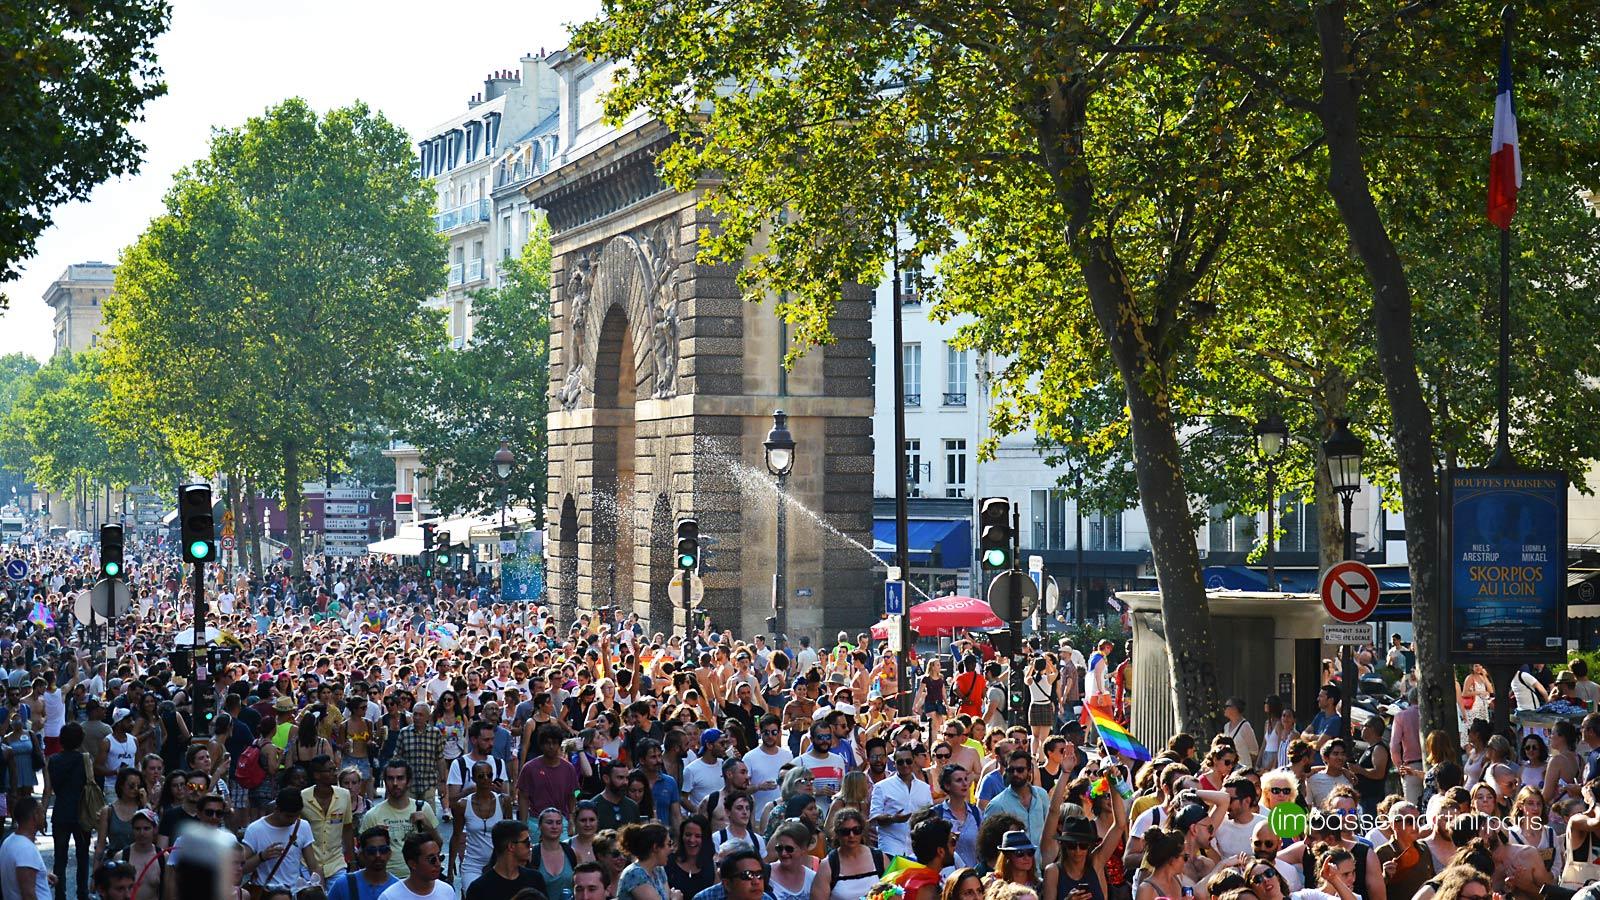 rencontre gay vivastreet paris à Saint-Martin